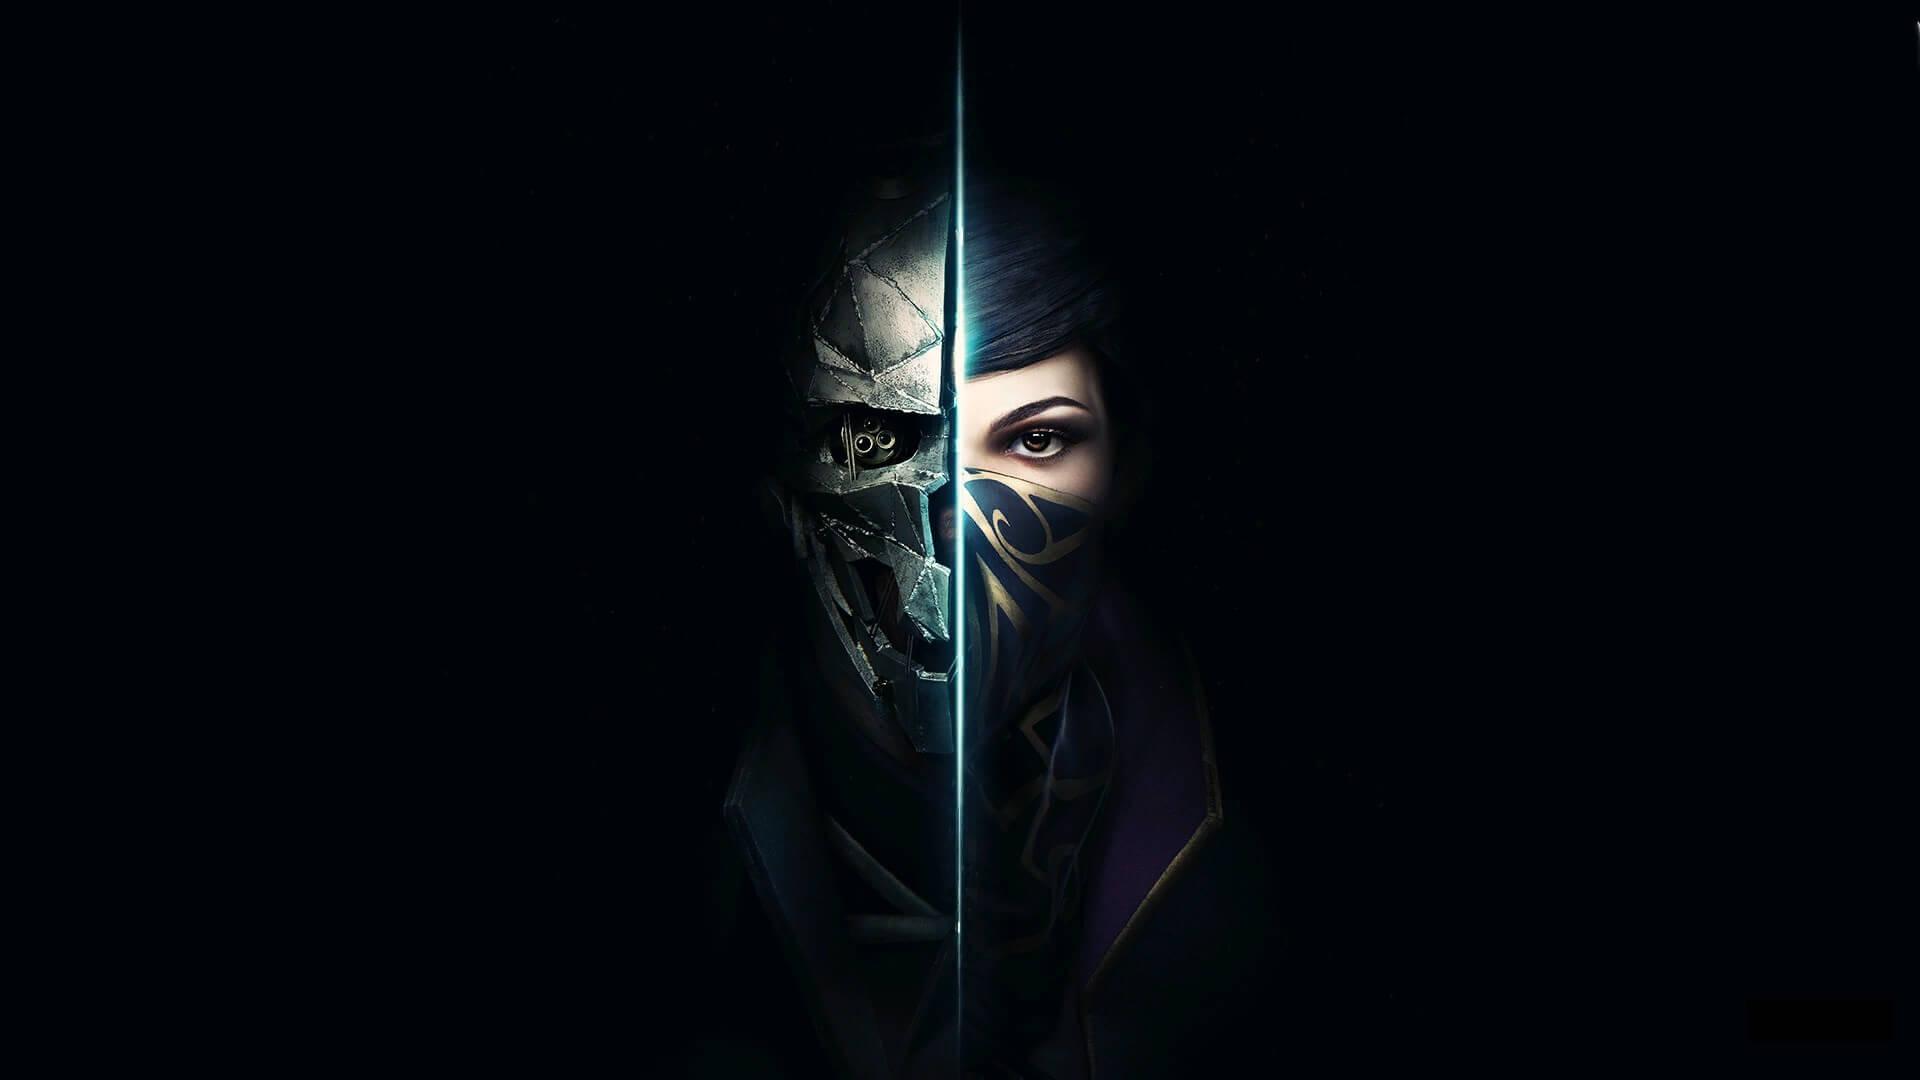 Speedrun Fast: Dishonored 2